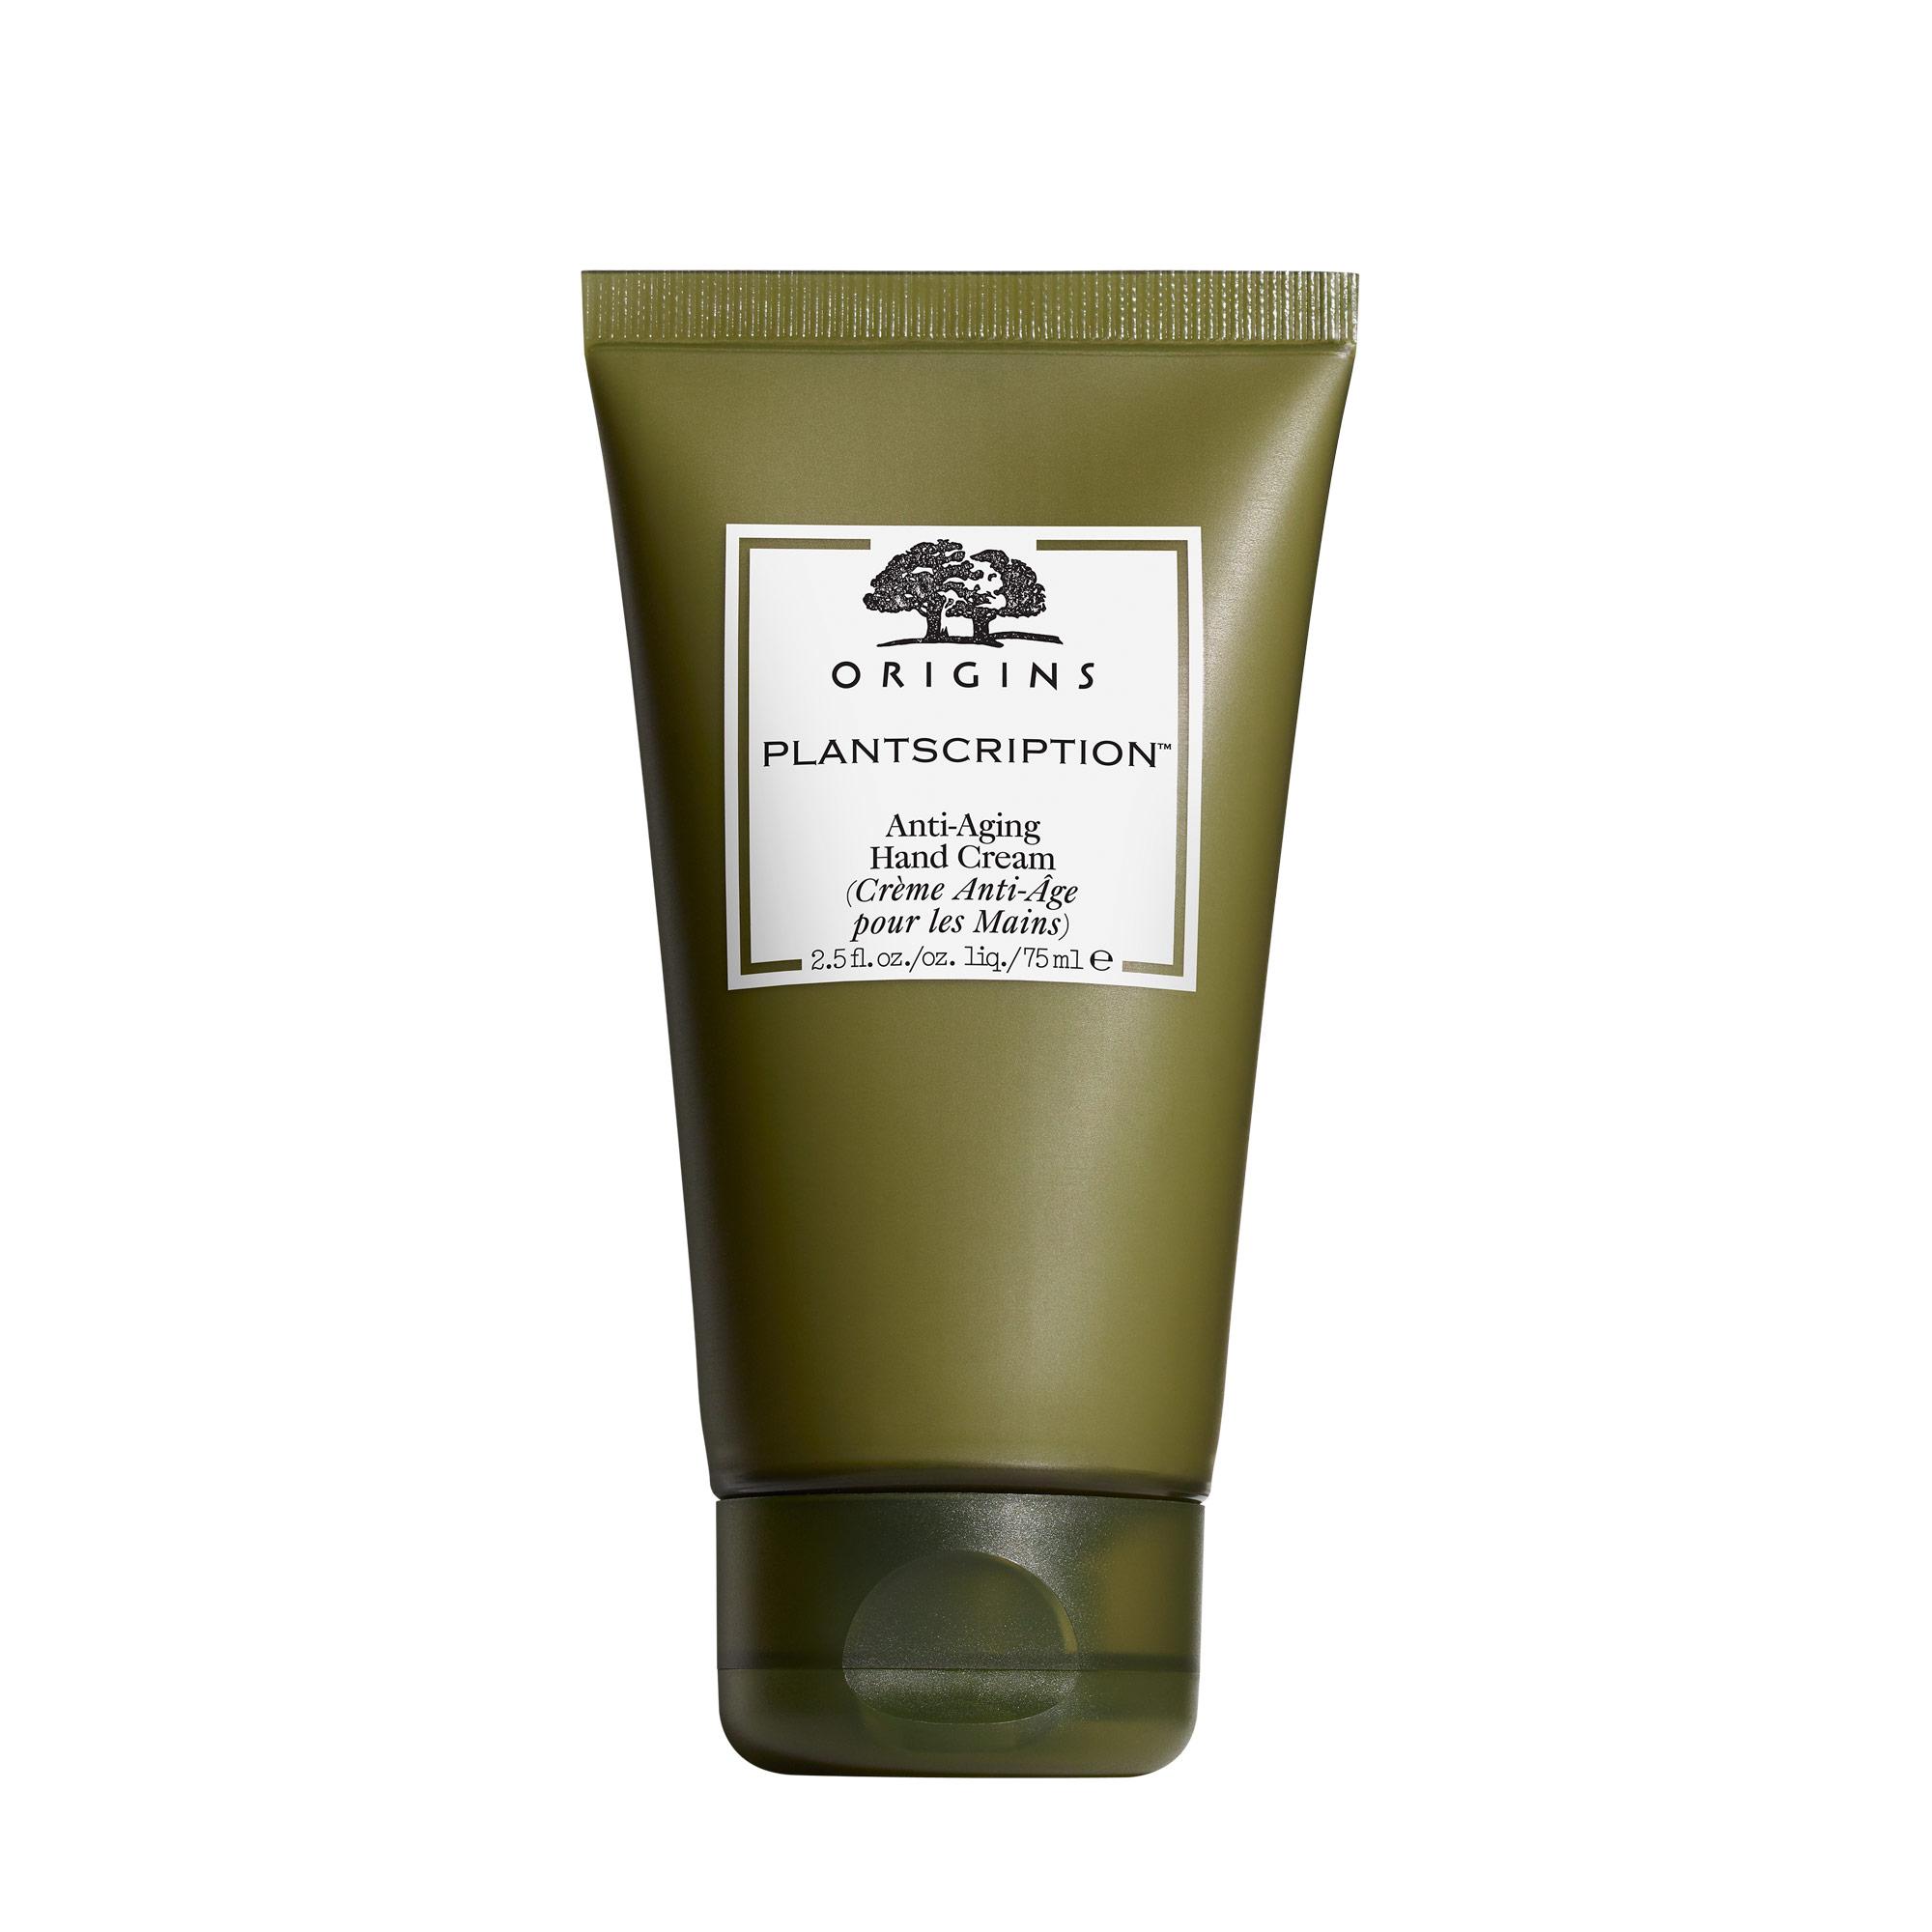 Plantscription Anti-Aging Hand Cream